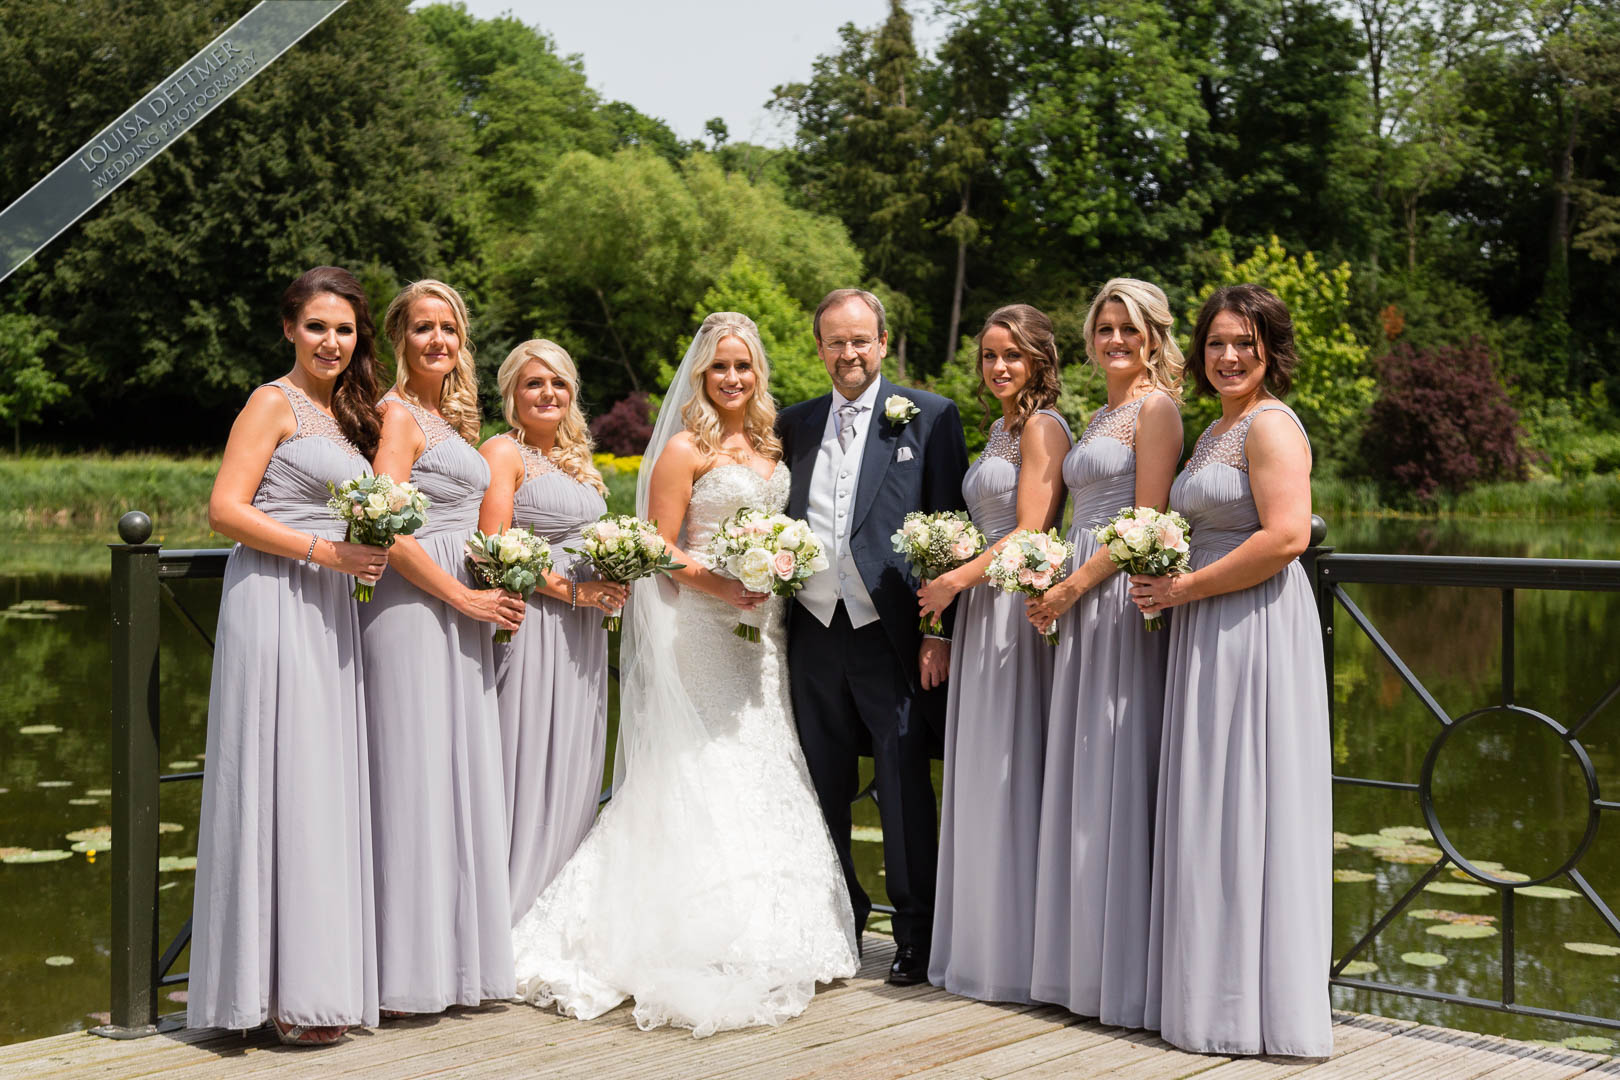 Louisa Dettmer Wedding Photography Sarah & Elliot, The Orangery Maidstone